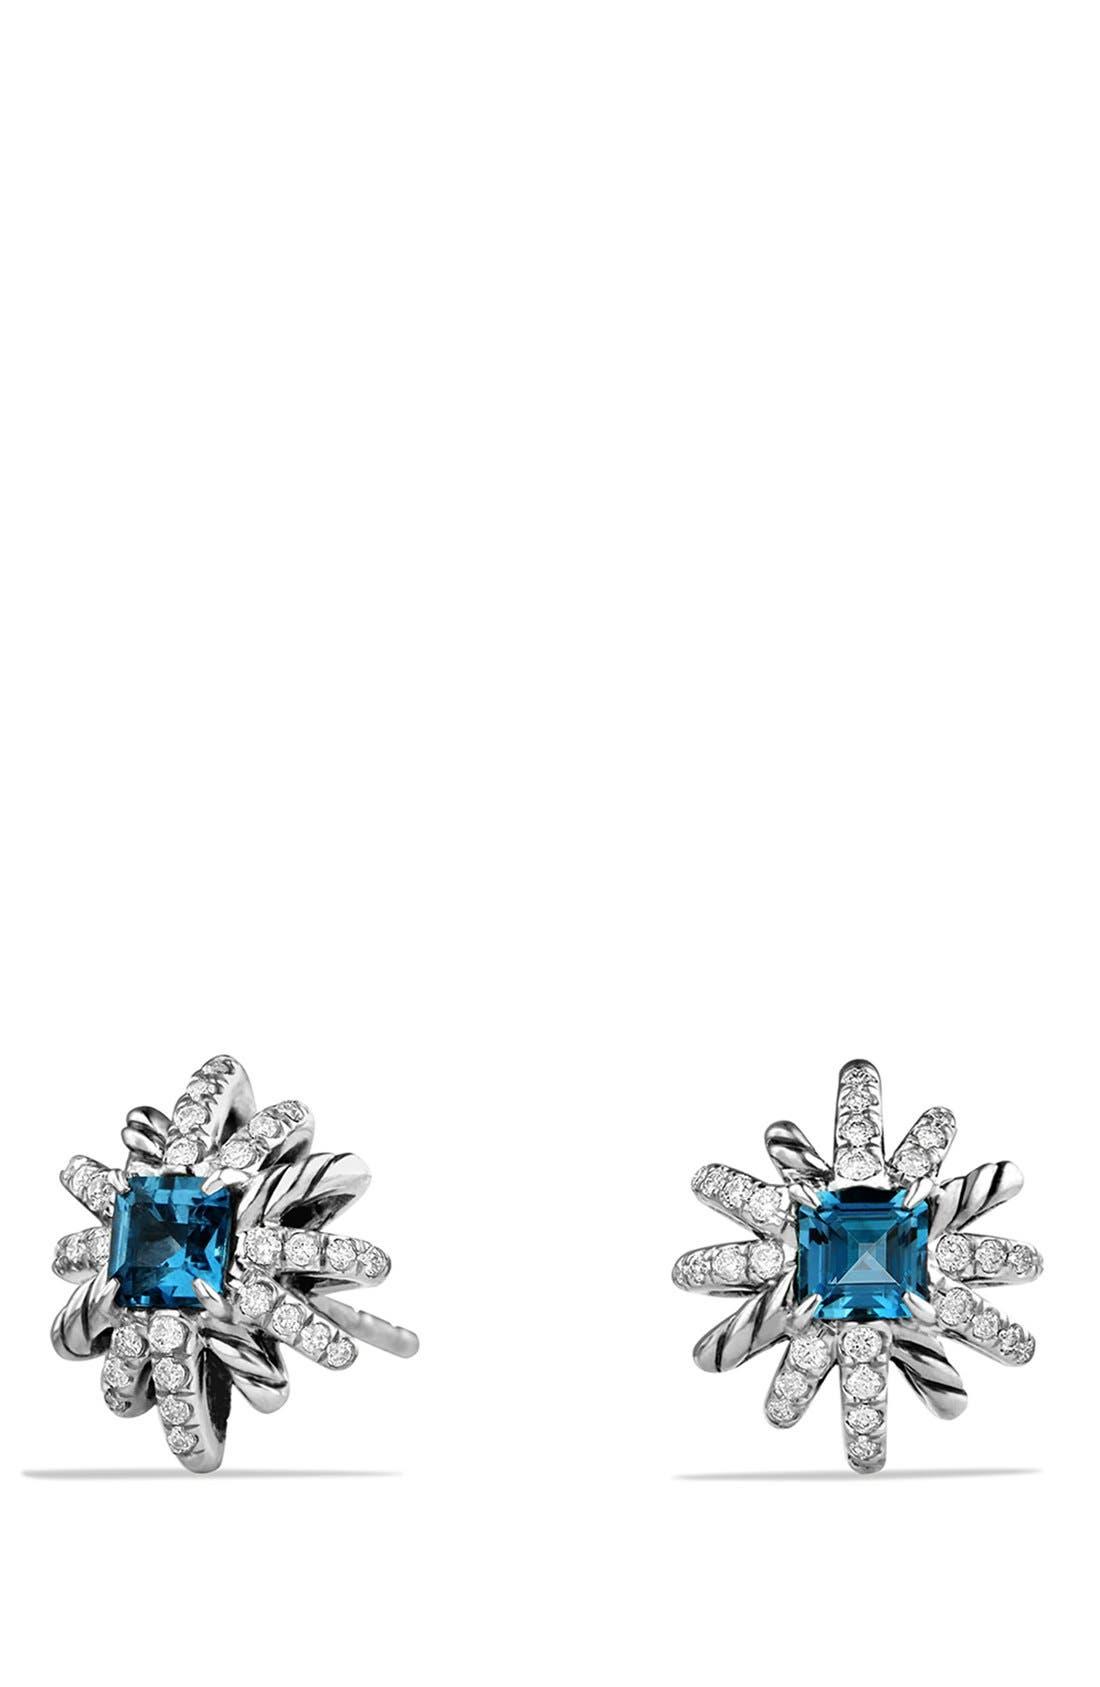 'Starburst' Earrings,                         Main,                         color, Hampton Blue Topaz